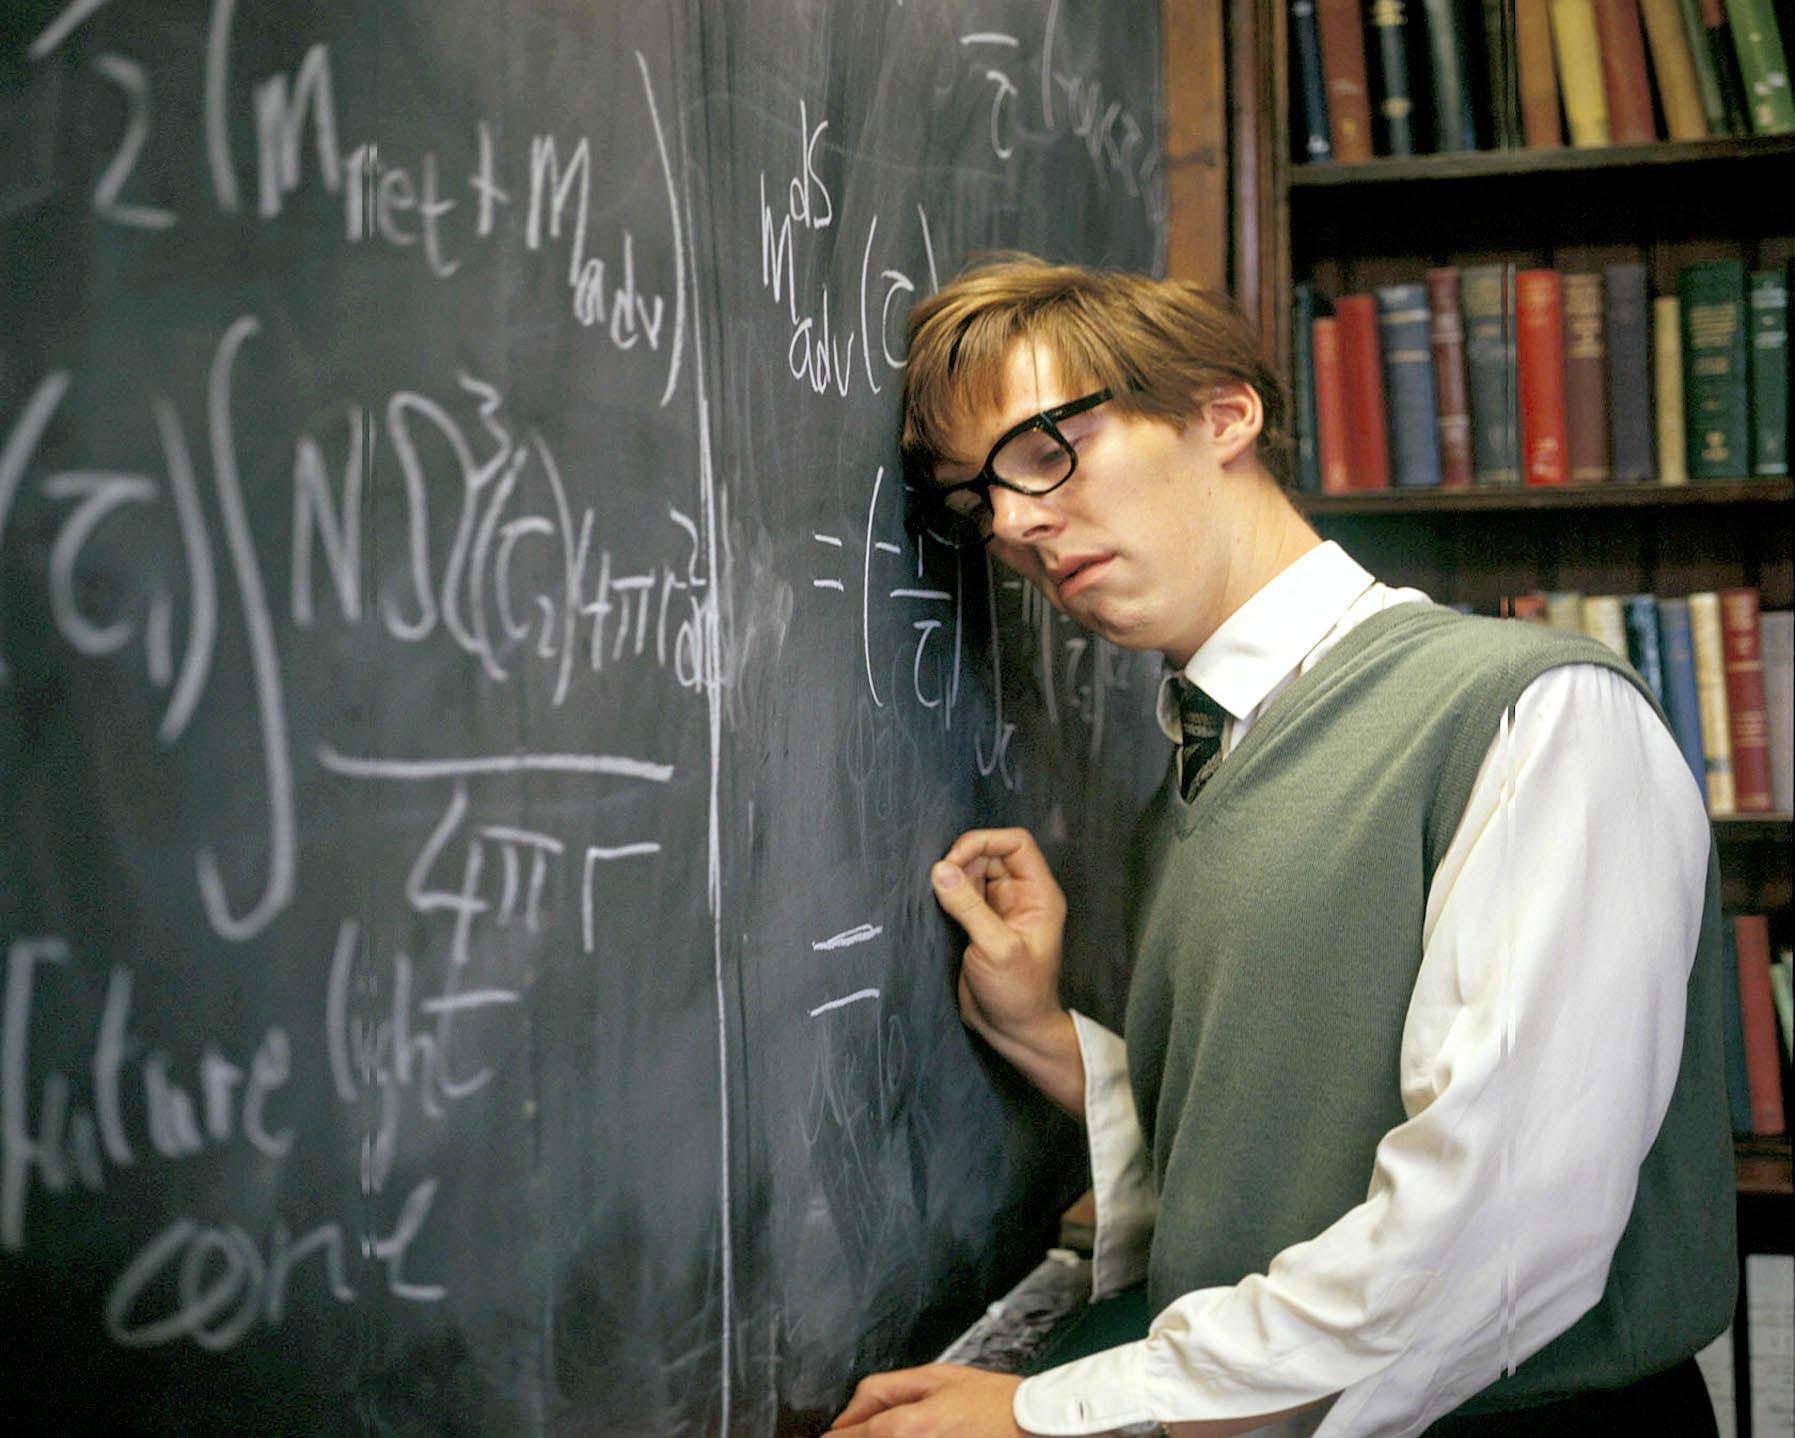 Hawking (Television) | Martin Freeman and Benedict Cumberbatch